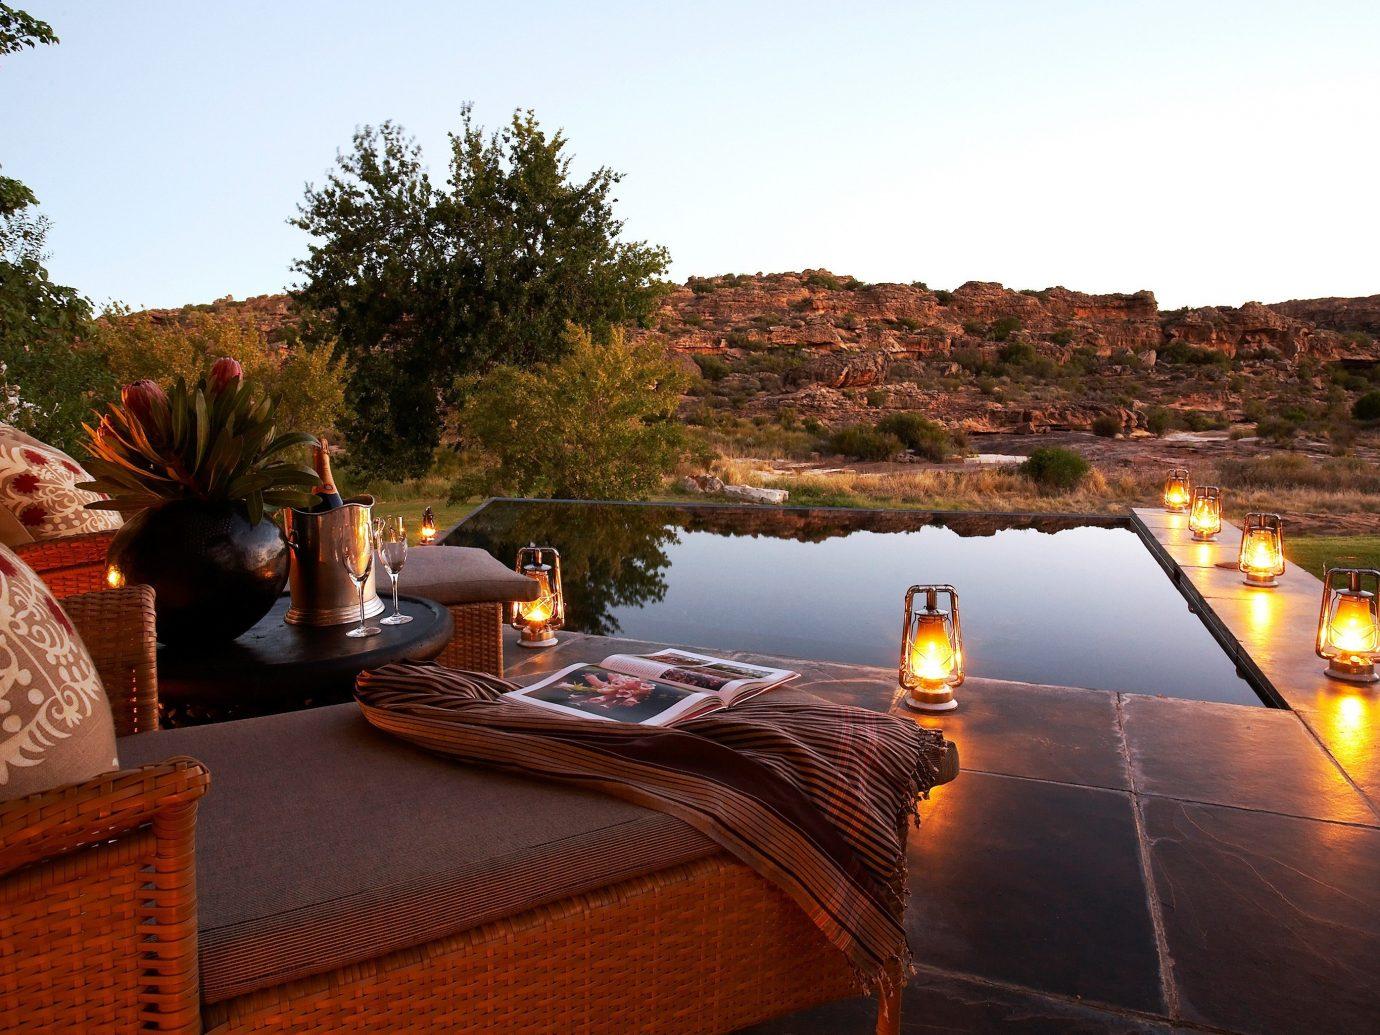 Hotels Offbeat sky outdoor swimming pool vacation estate Resort home Villa backyard